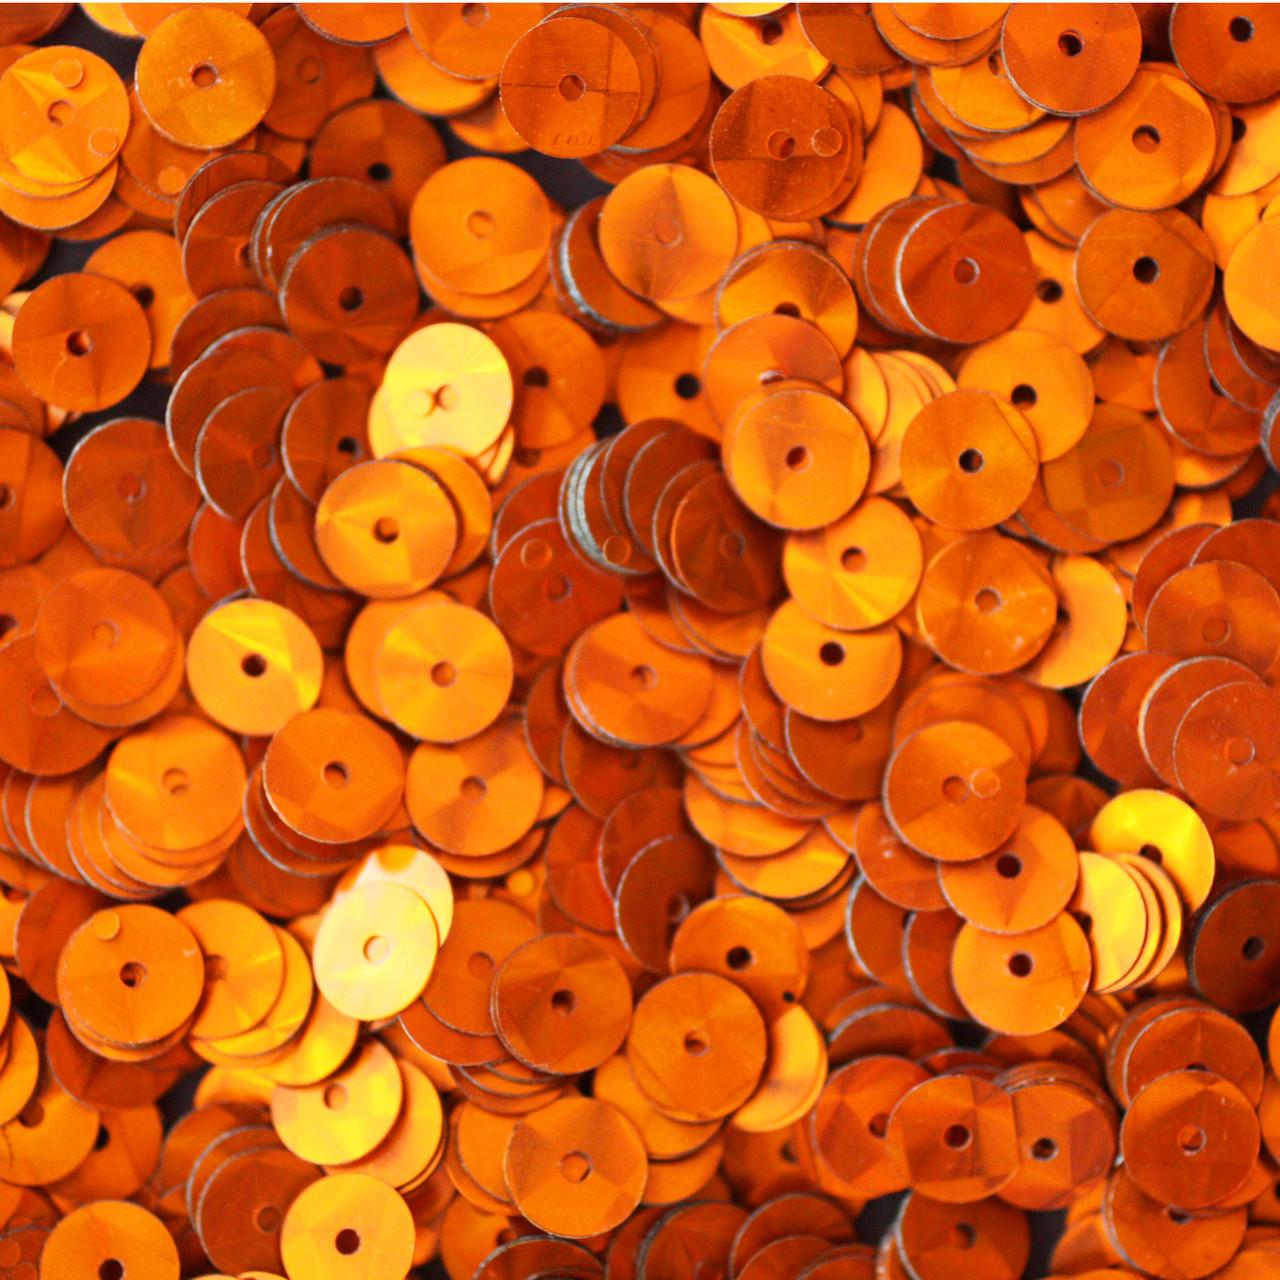 Made in USA 20mm Flat Round Sequin Paillettes Orange Prism Metallic